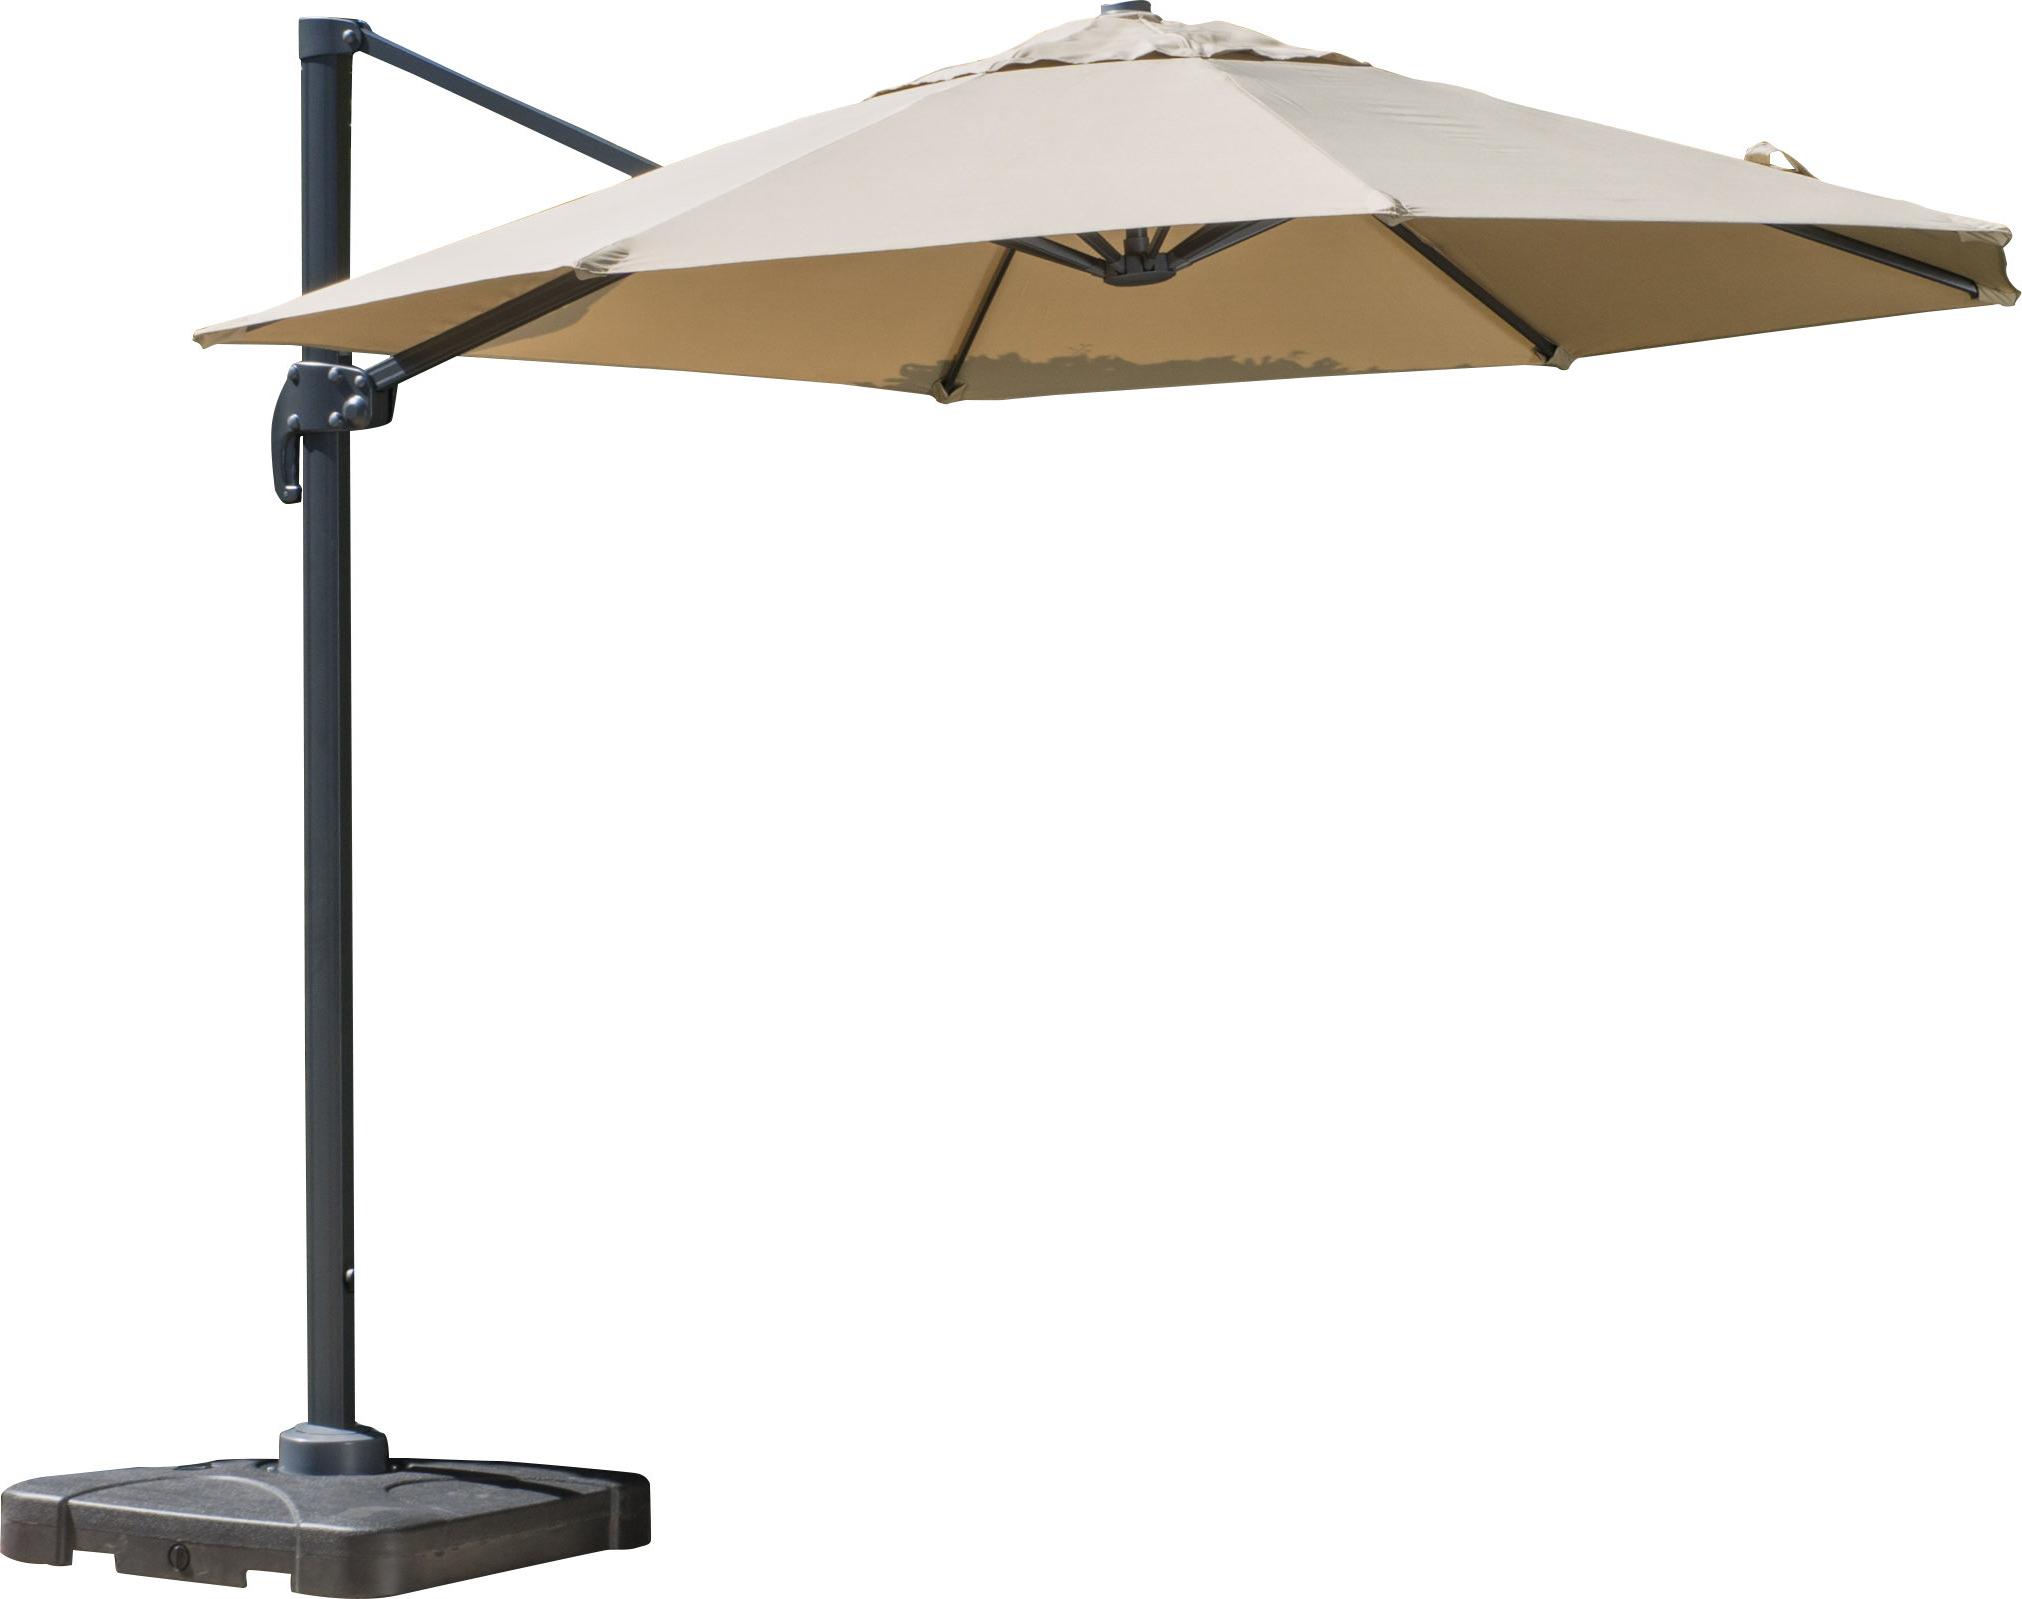 Bellana Cantilever Umbrella With Fashionable Wardingham Square Cantilever Umbrellas (Gallery 7 of 20)